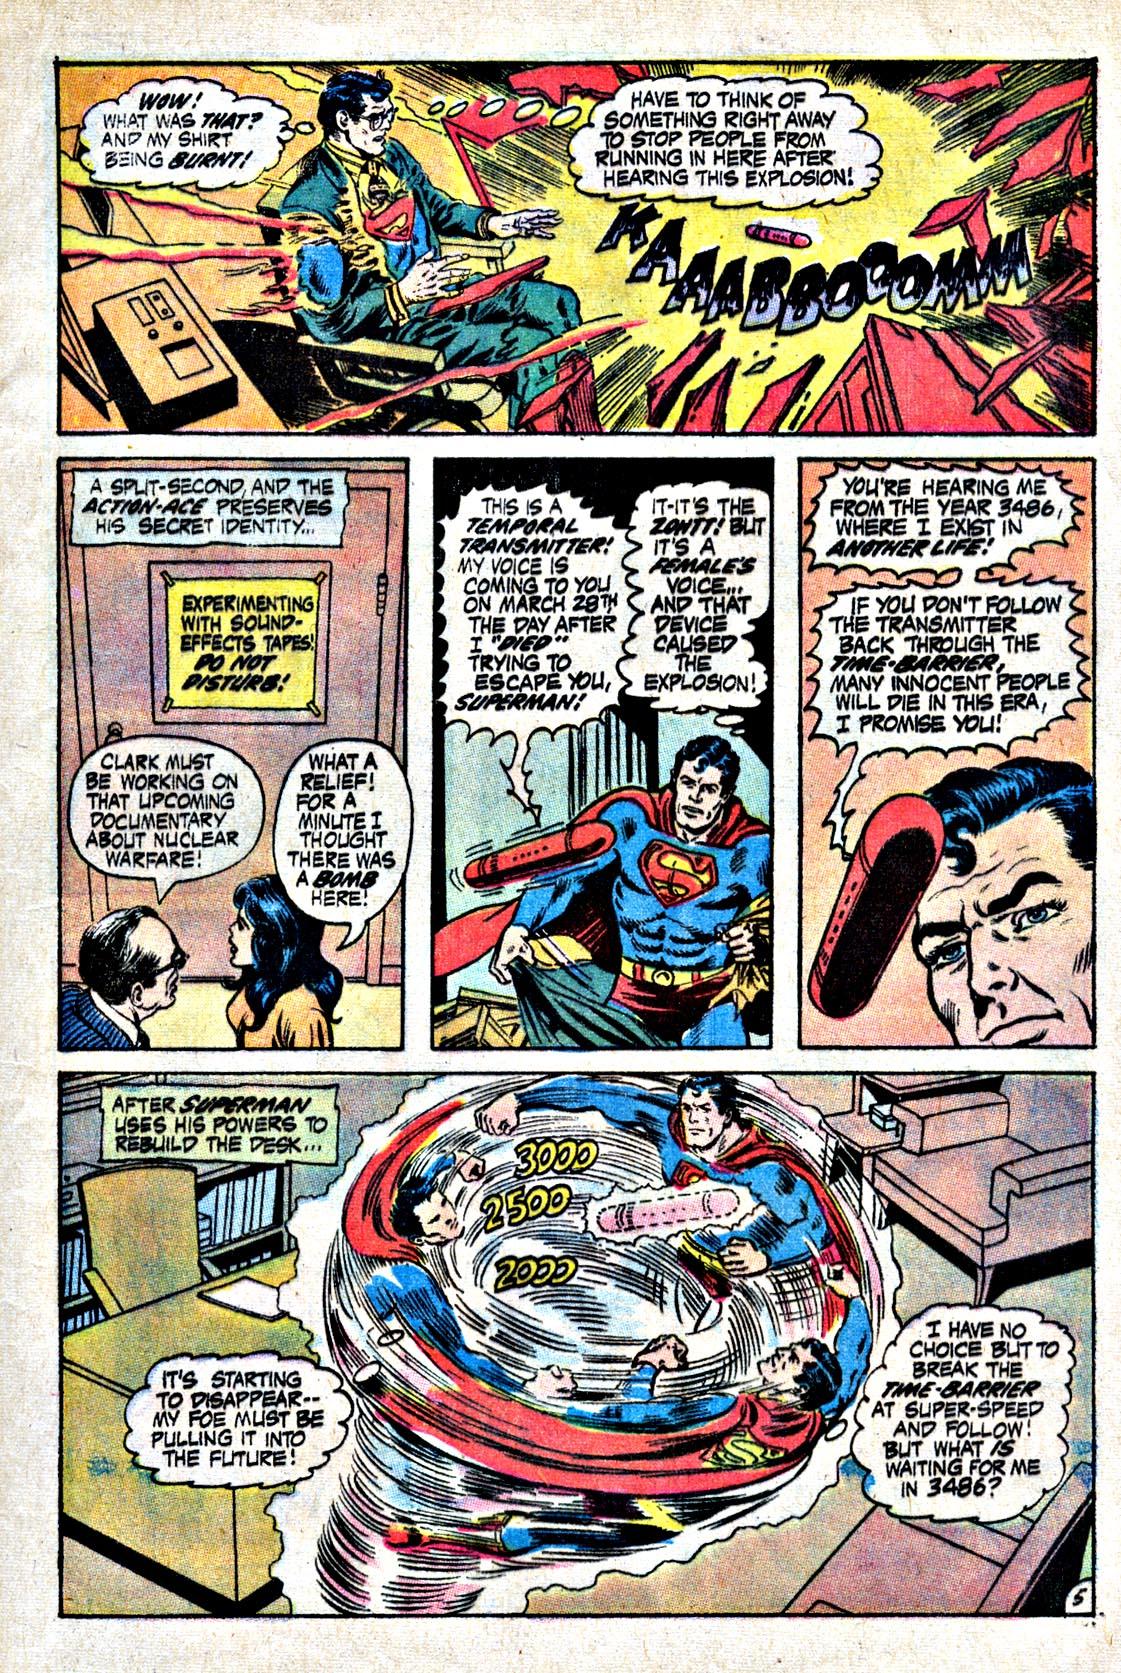 Action Comics (1938) 403 Page 7